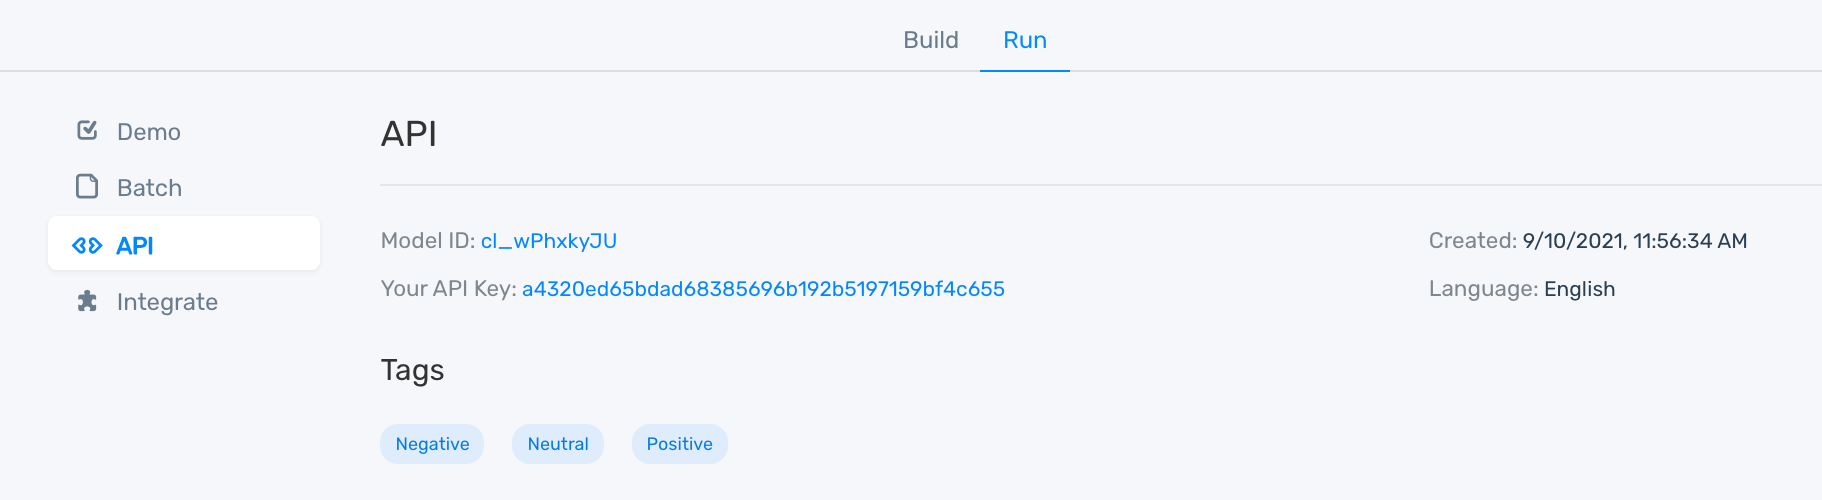 Details of MonkeyLearn's sentiment analysis API (model ID and API key)